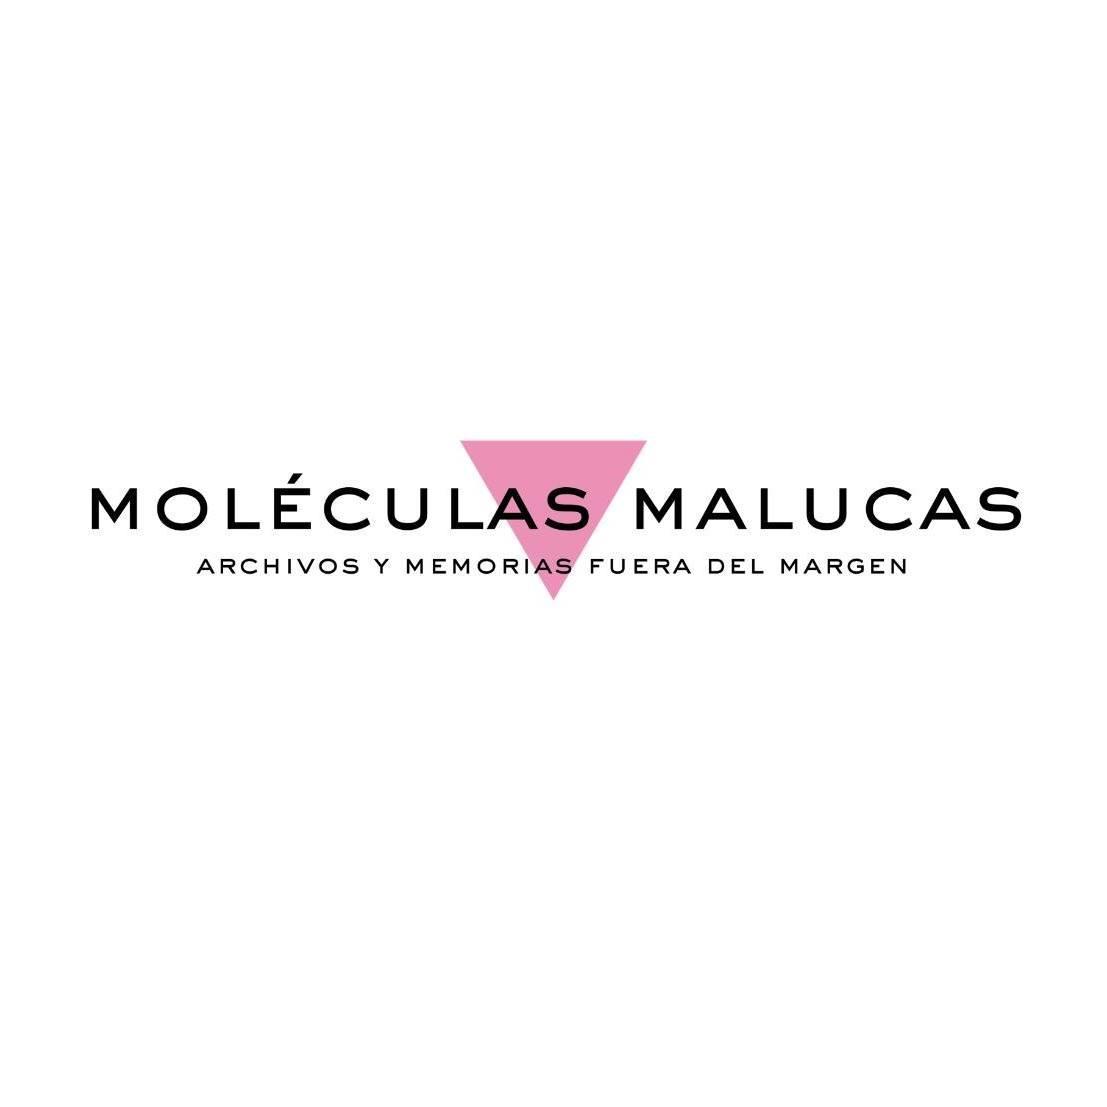 Moléculas Malucas